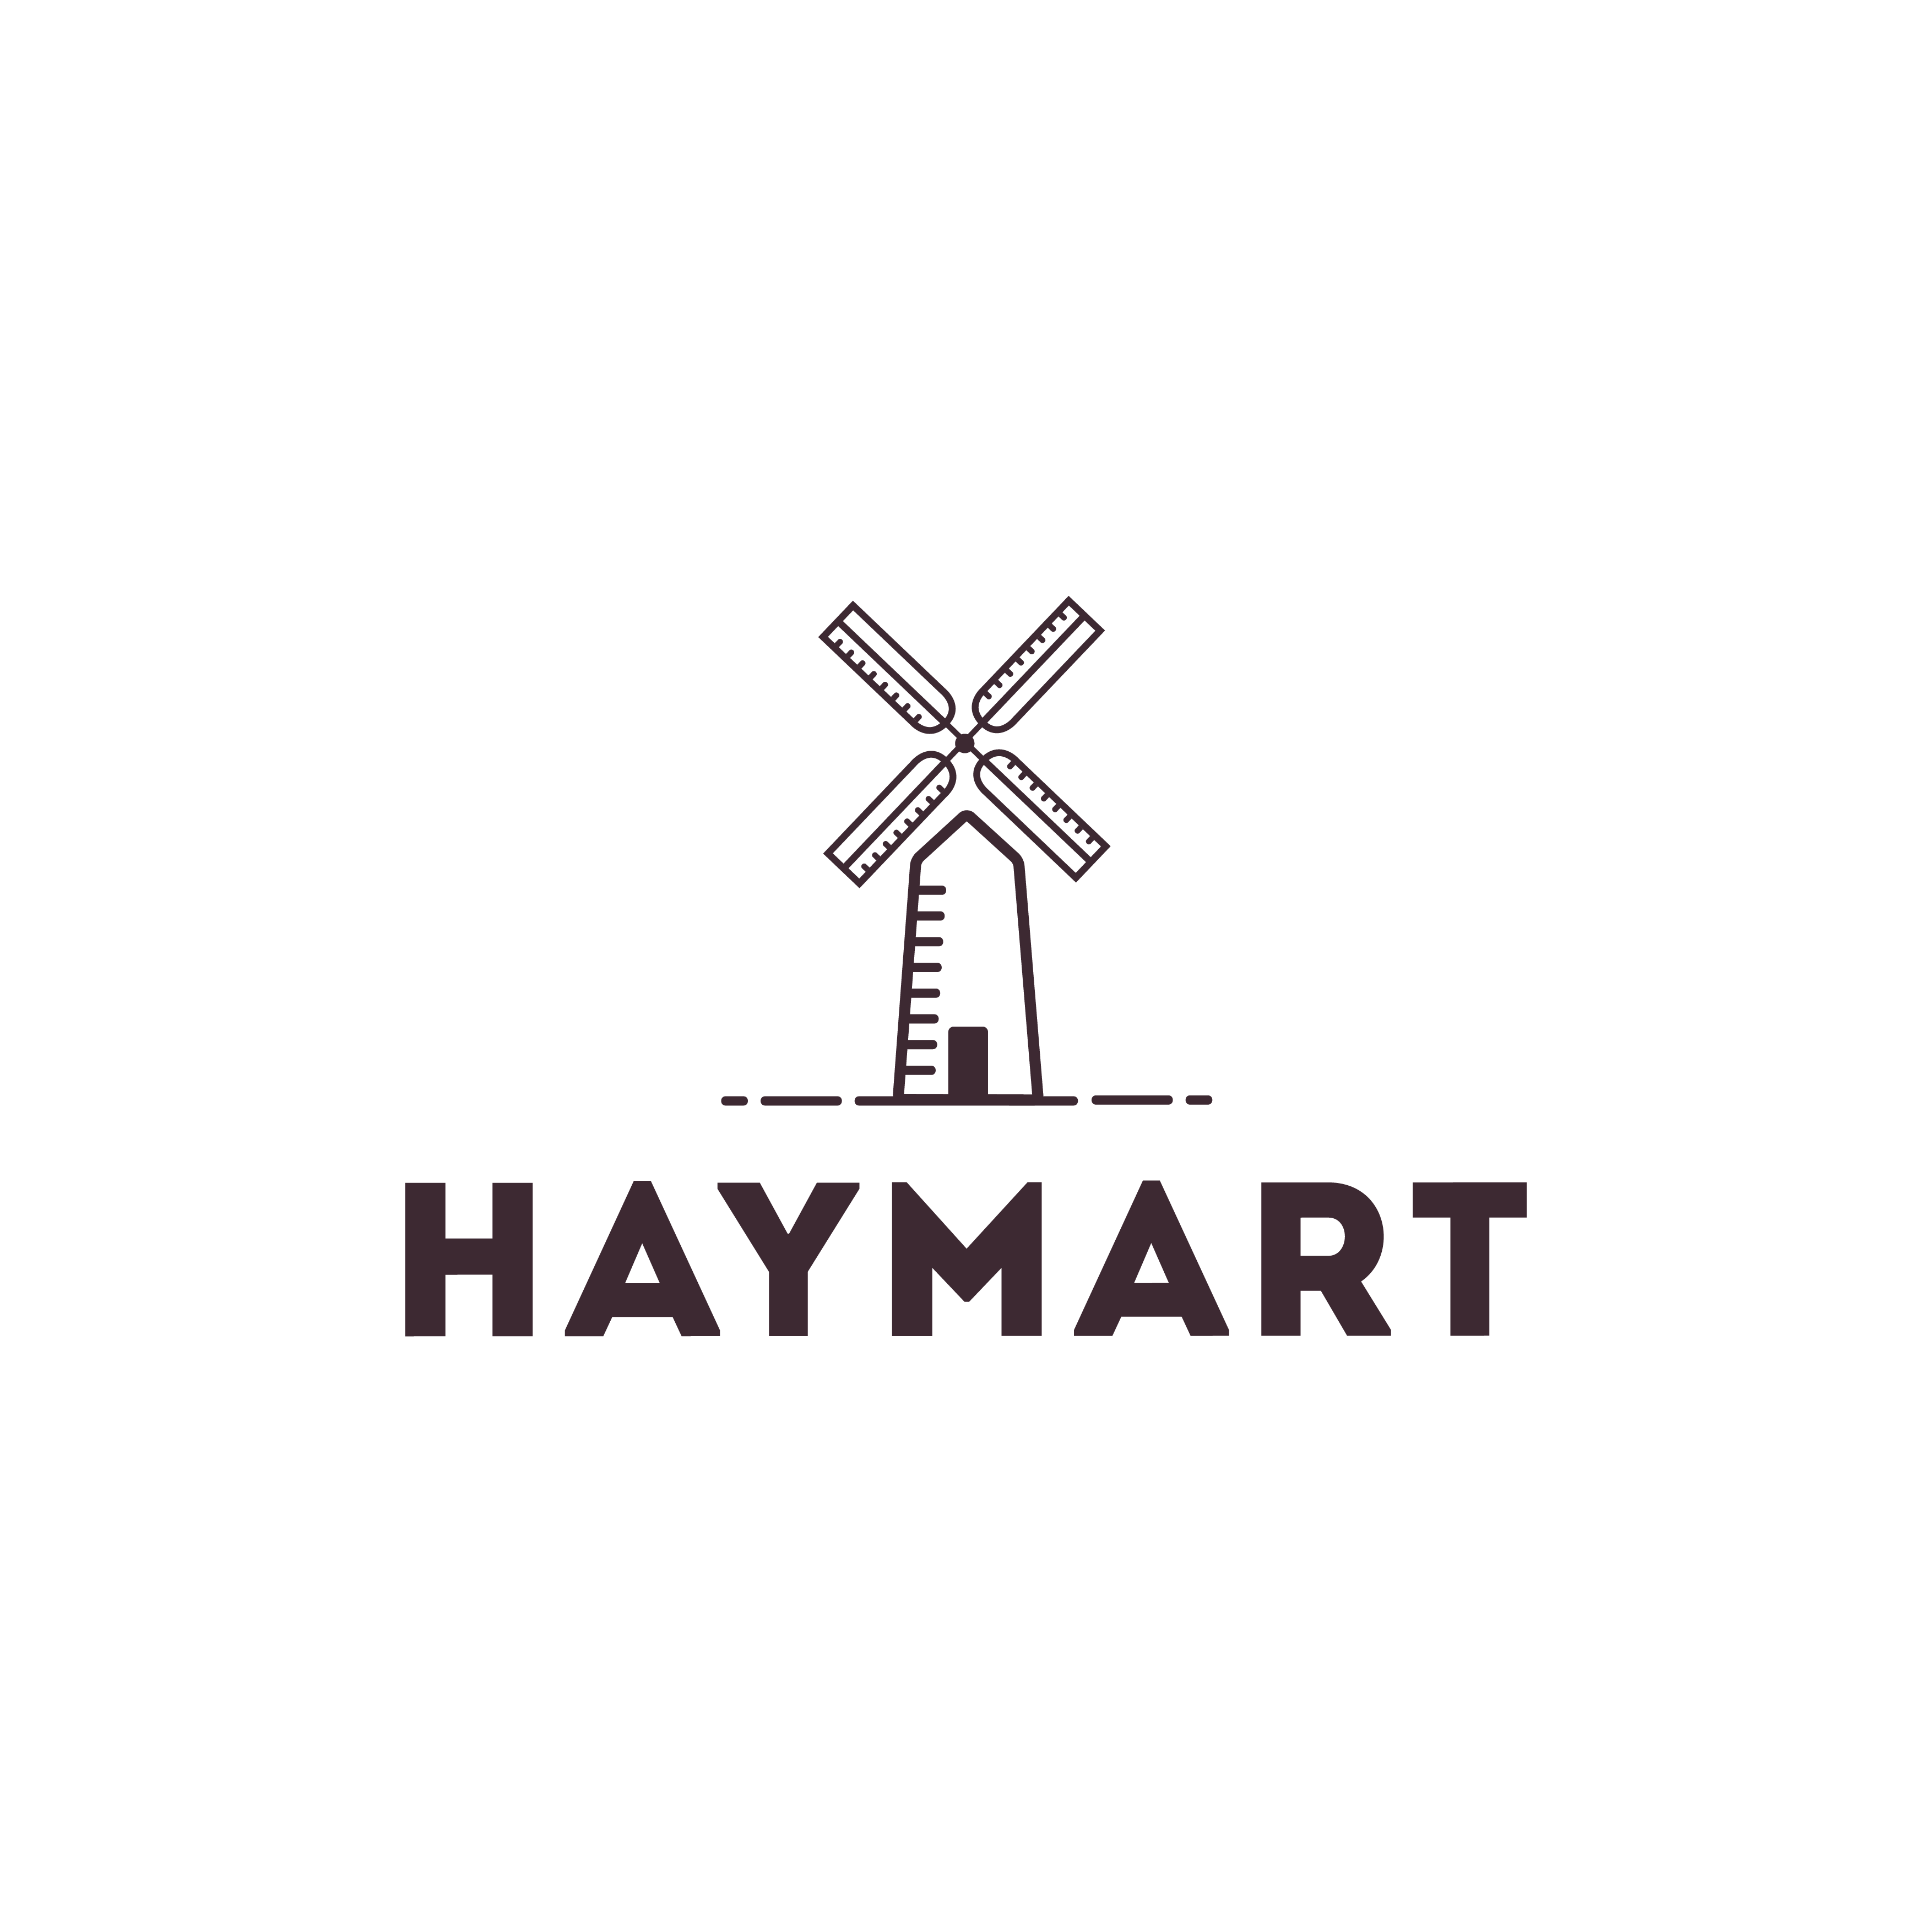 Haymart LLC